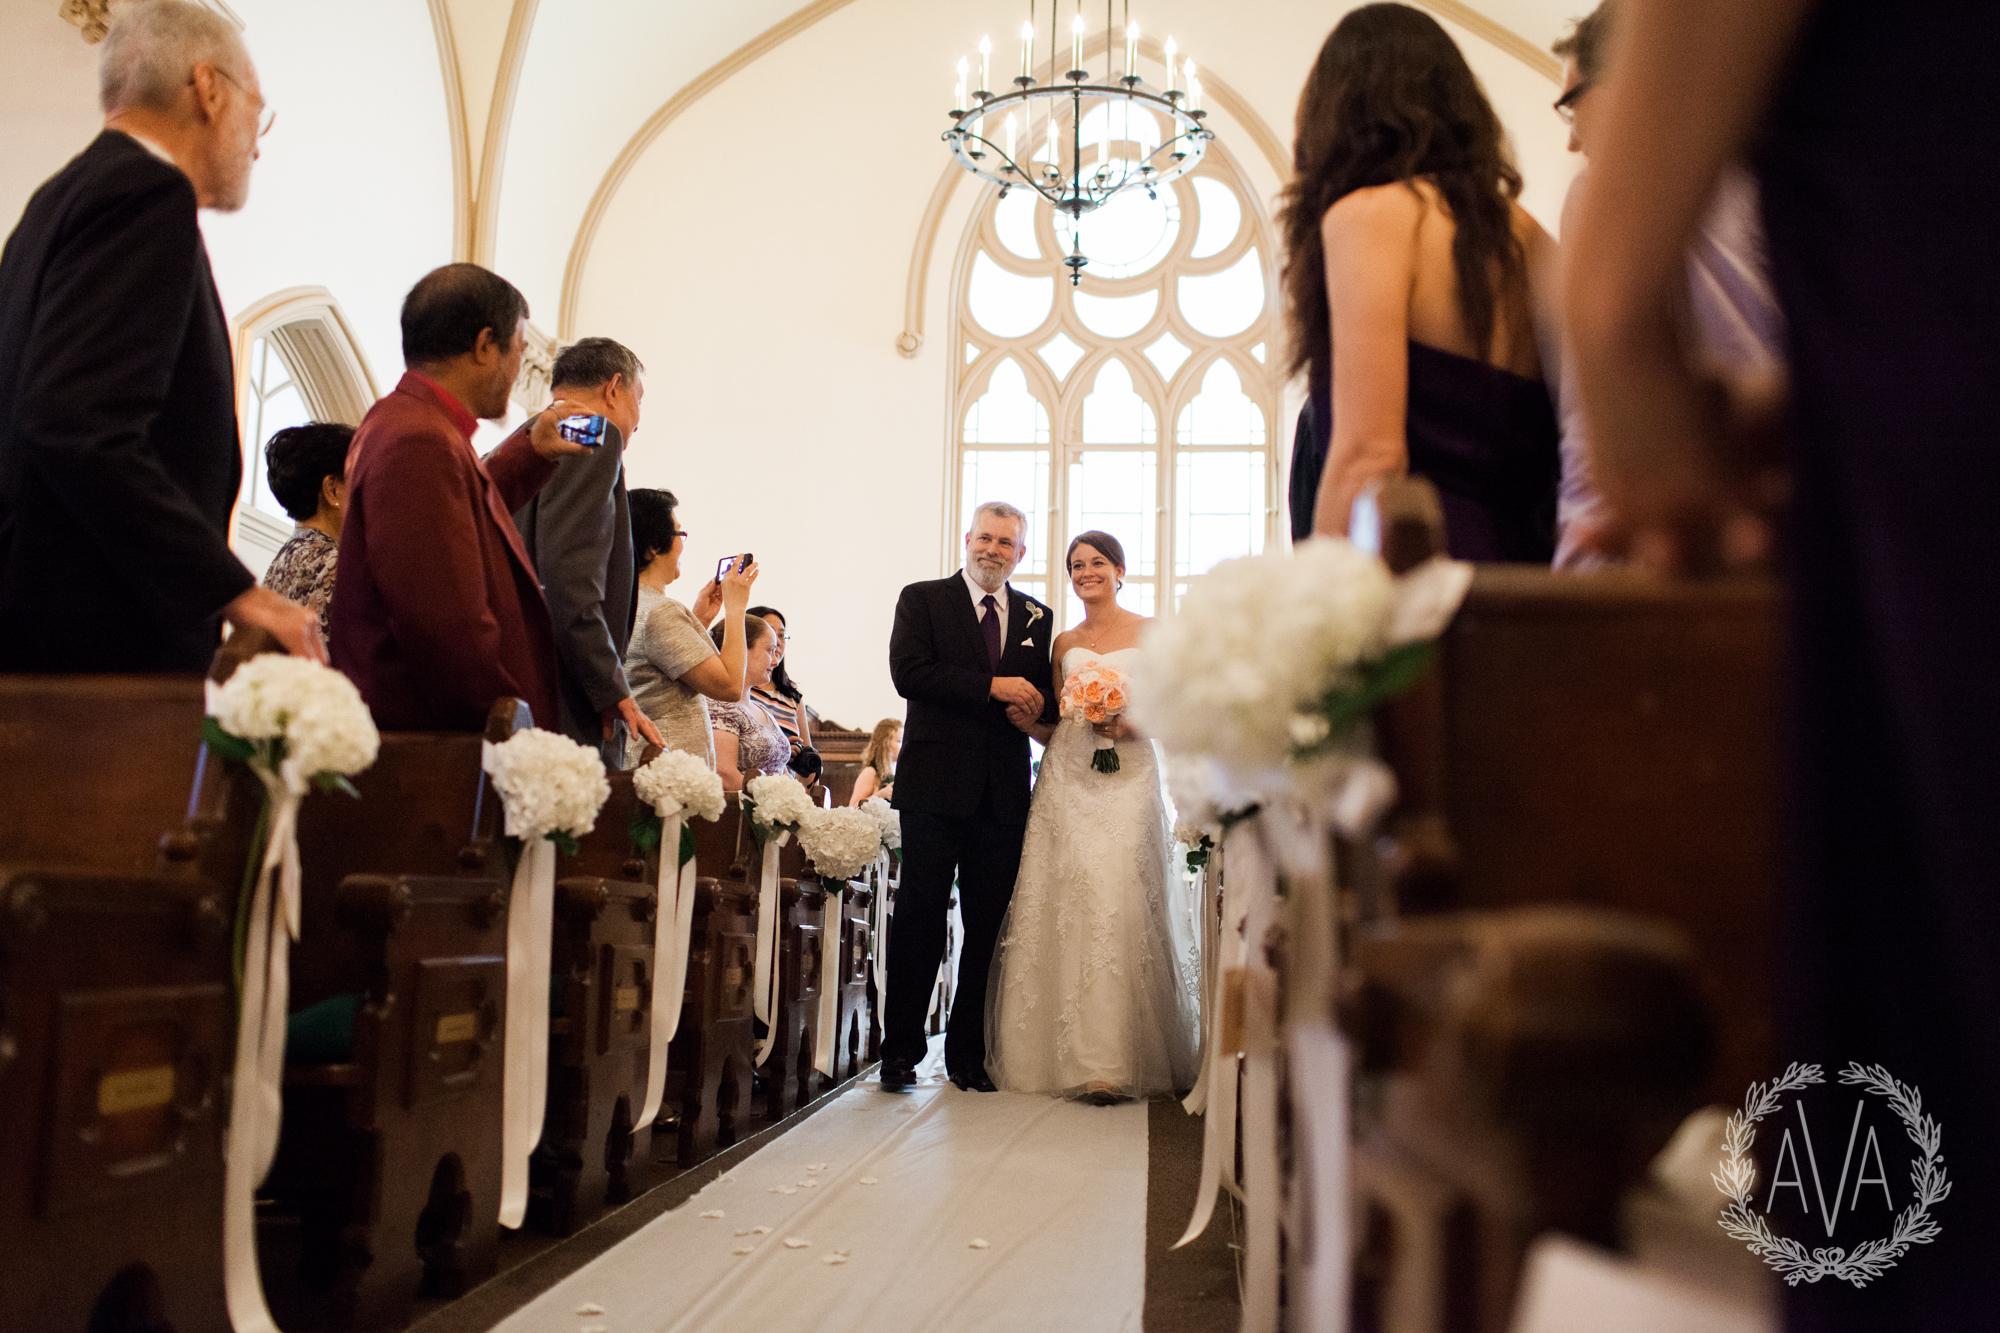 ava_chiew_wedding-49.jpg